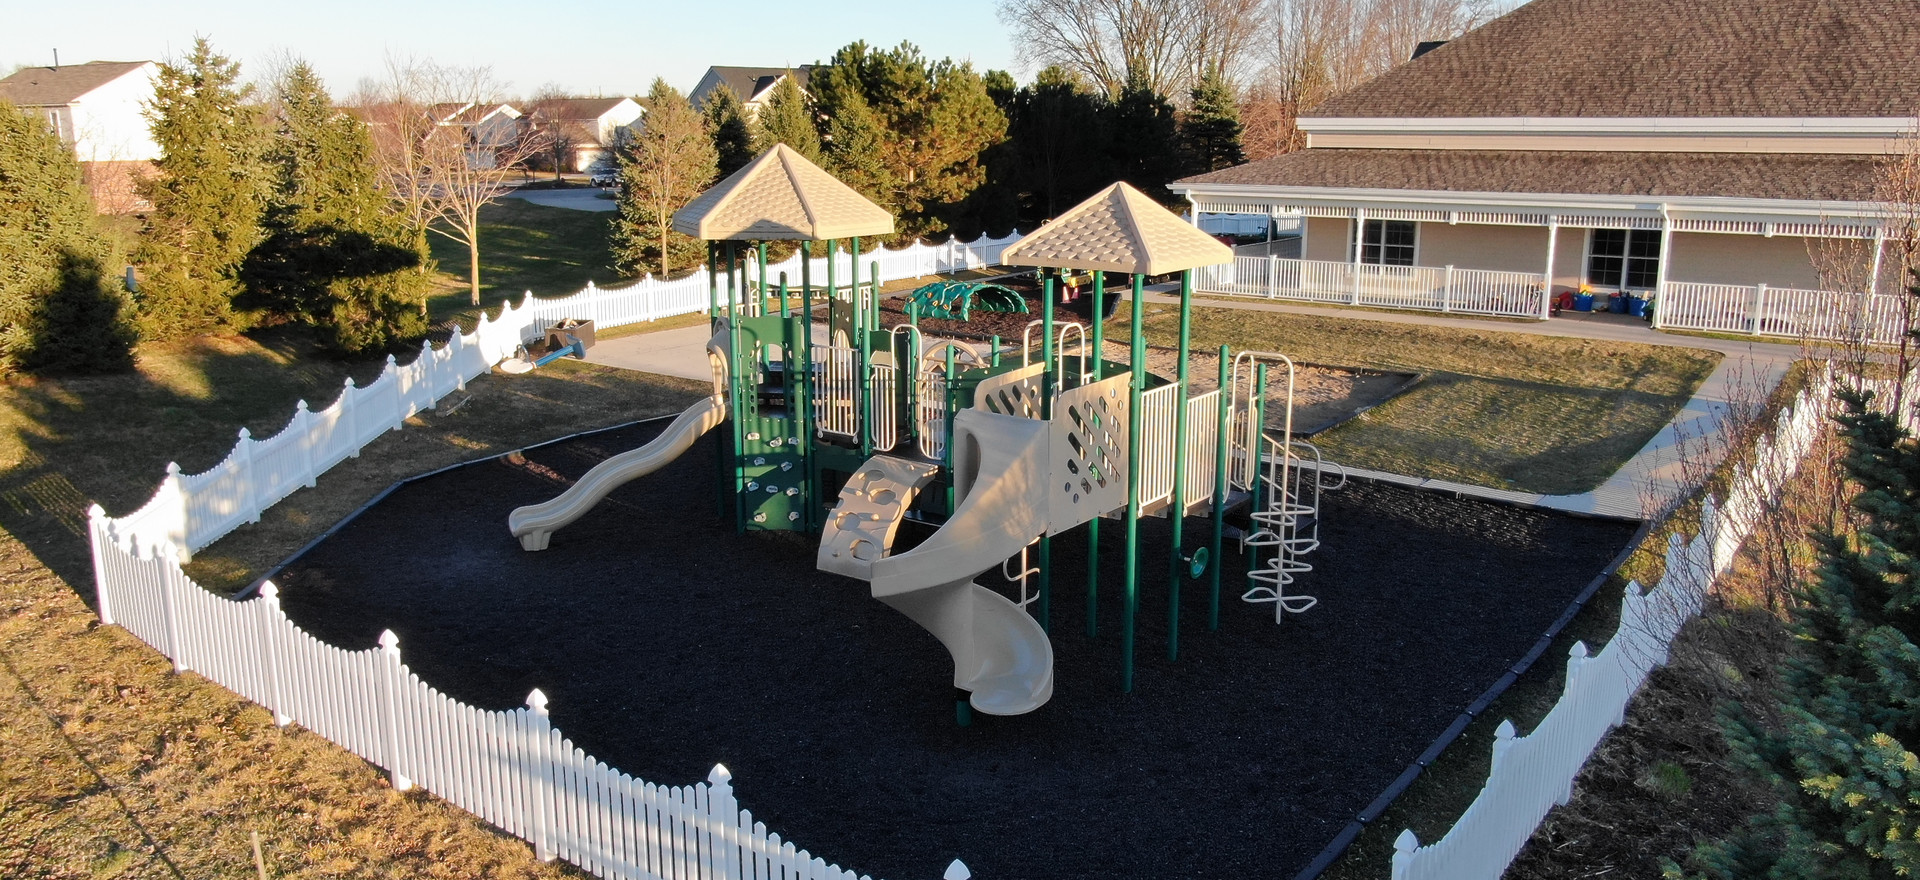 Building B Playground